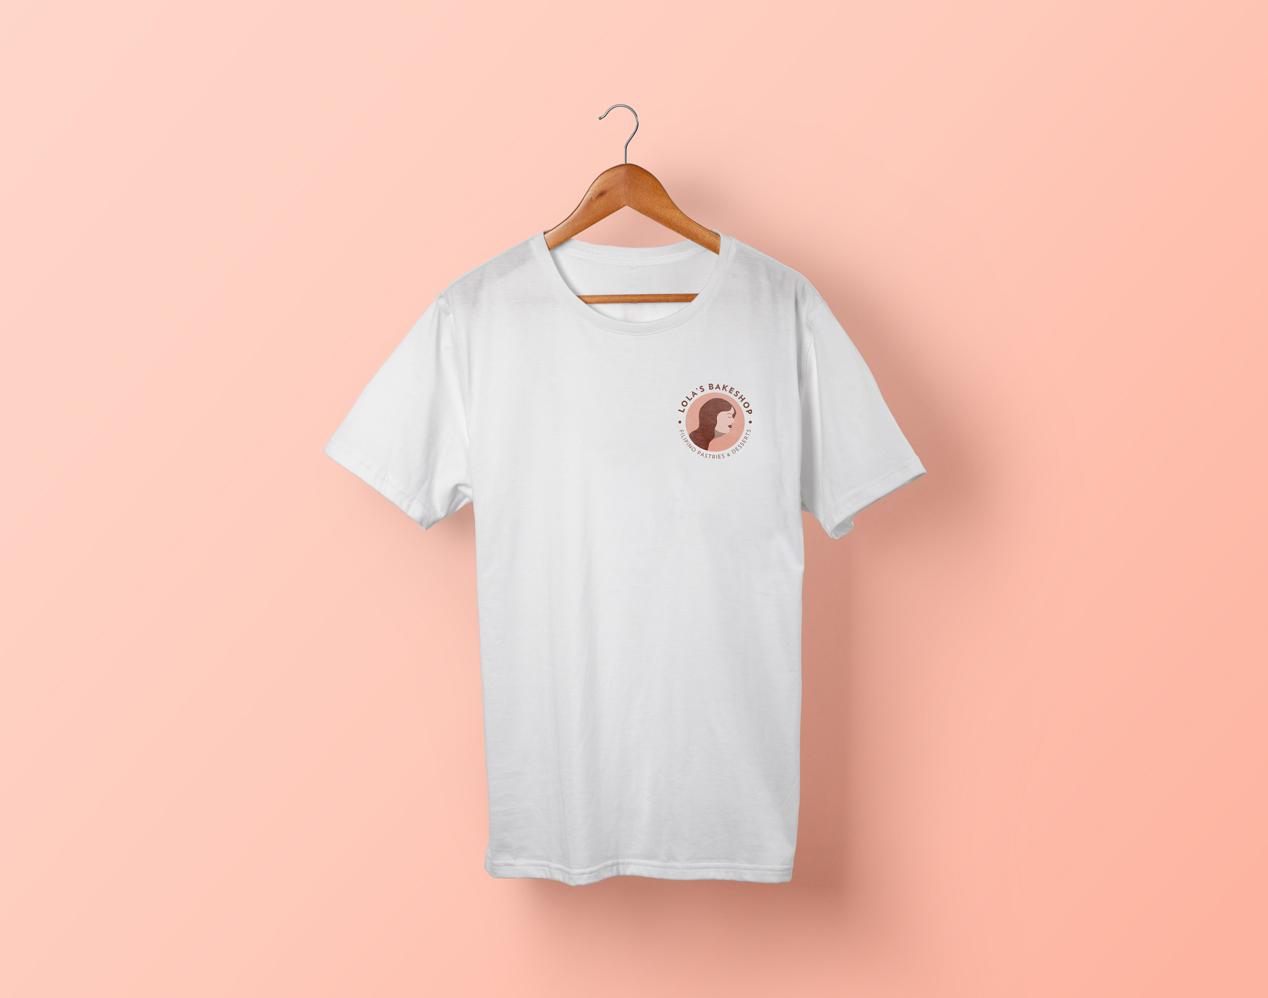 shirt-mock